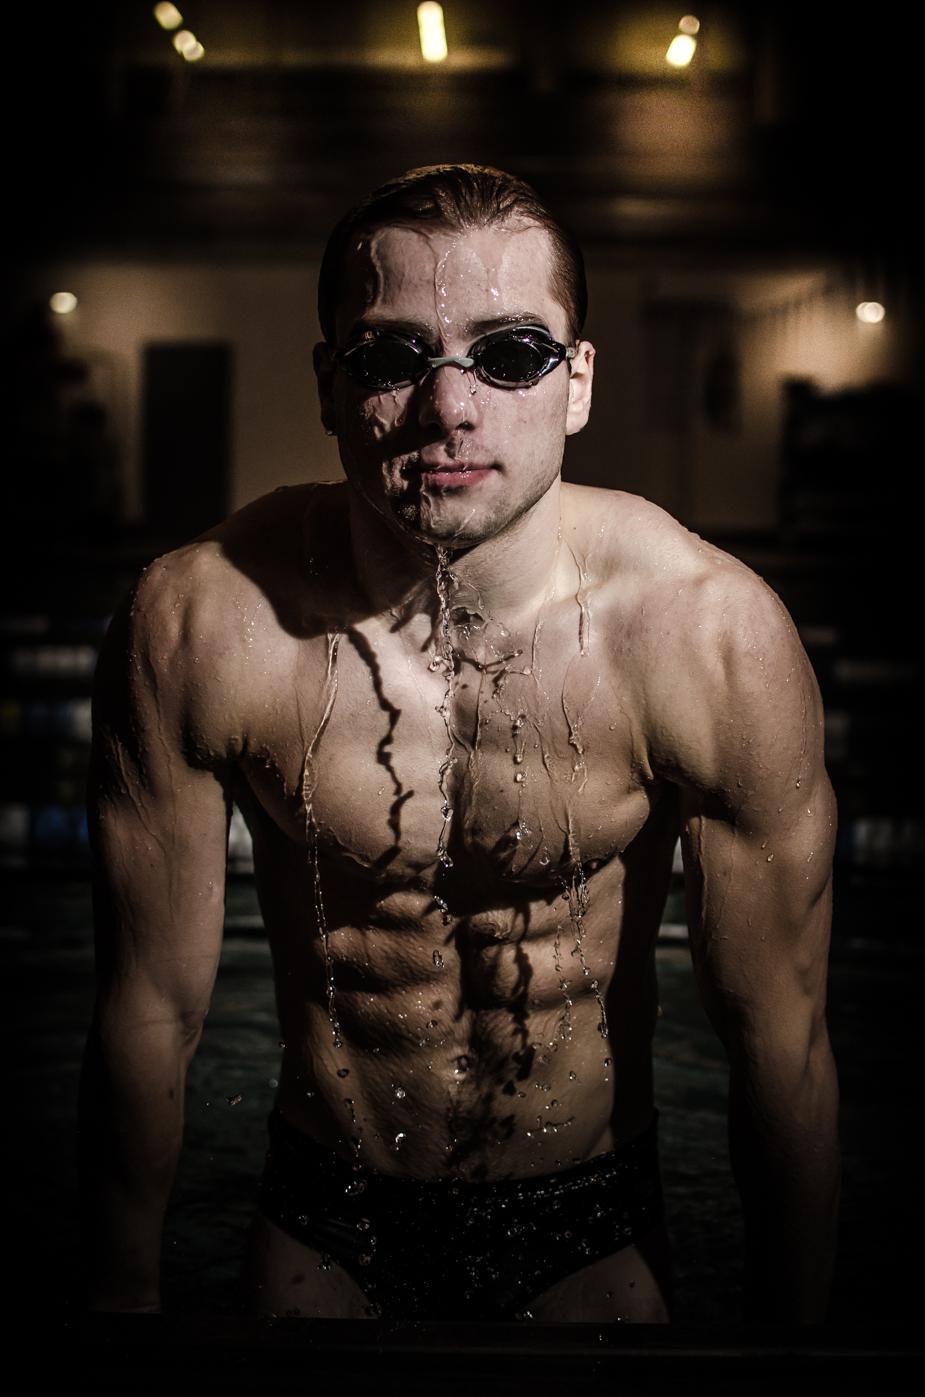 high school senior swim photos akron photographer joel echelberger (2 of 2)